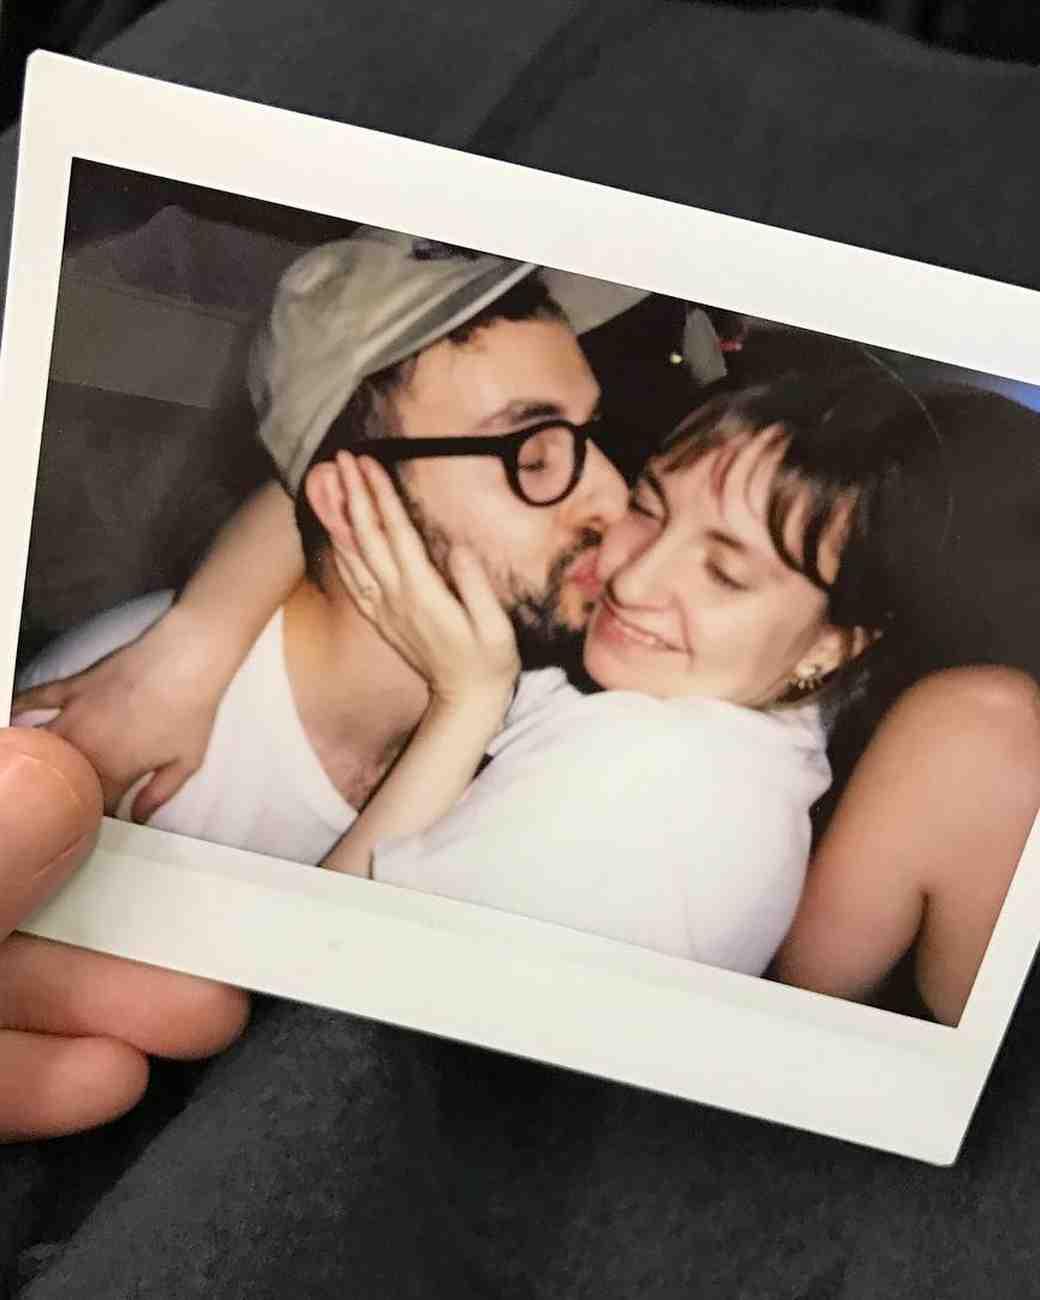 Lena Dunham and Jack Antonoff Polaroid Photograph